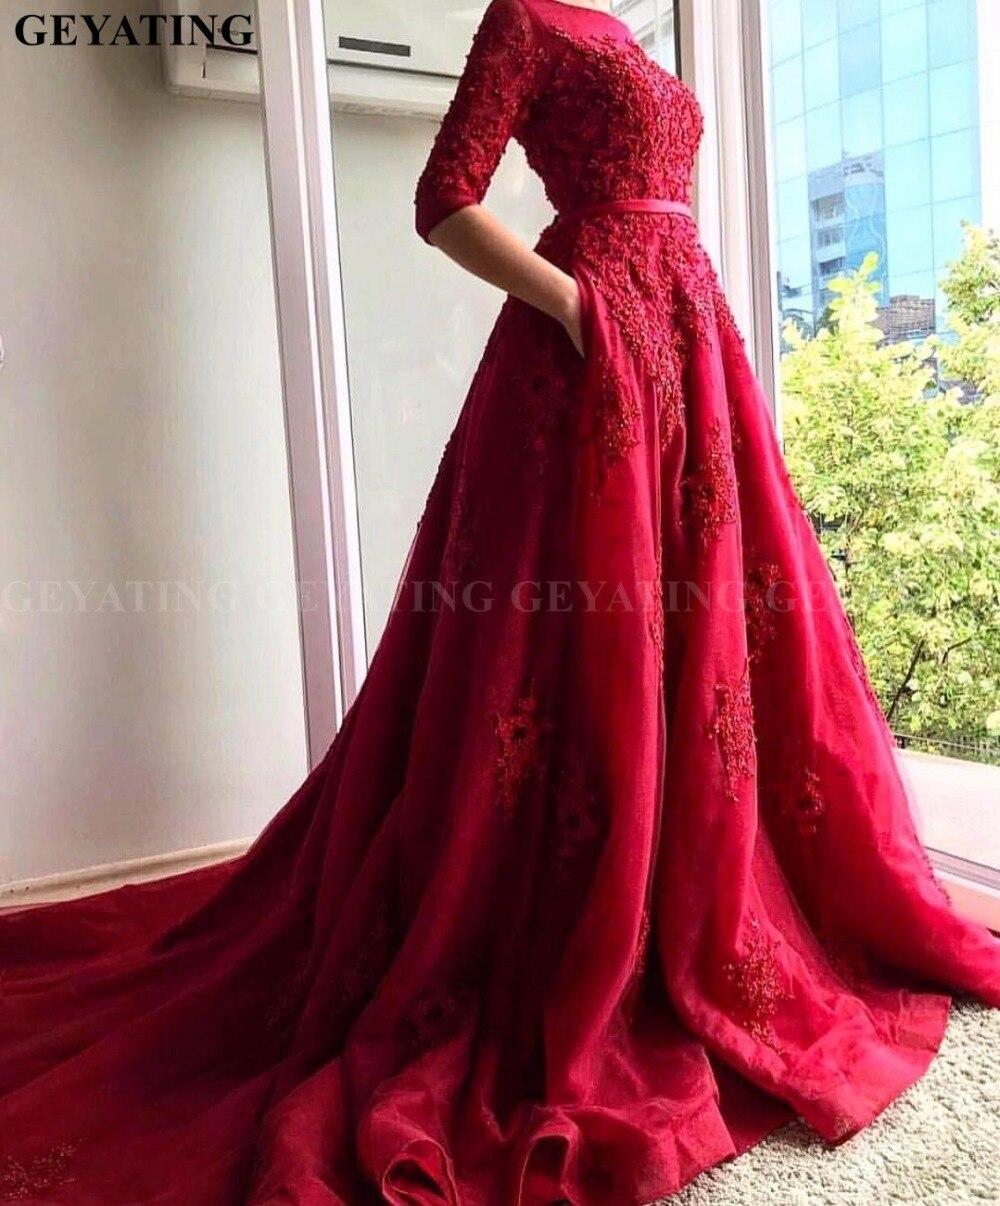 Elegant 3/4 Long Sleeves Red Engagement Evening Dresses